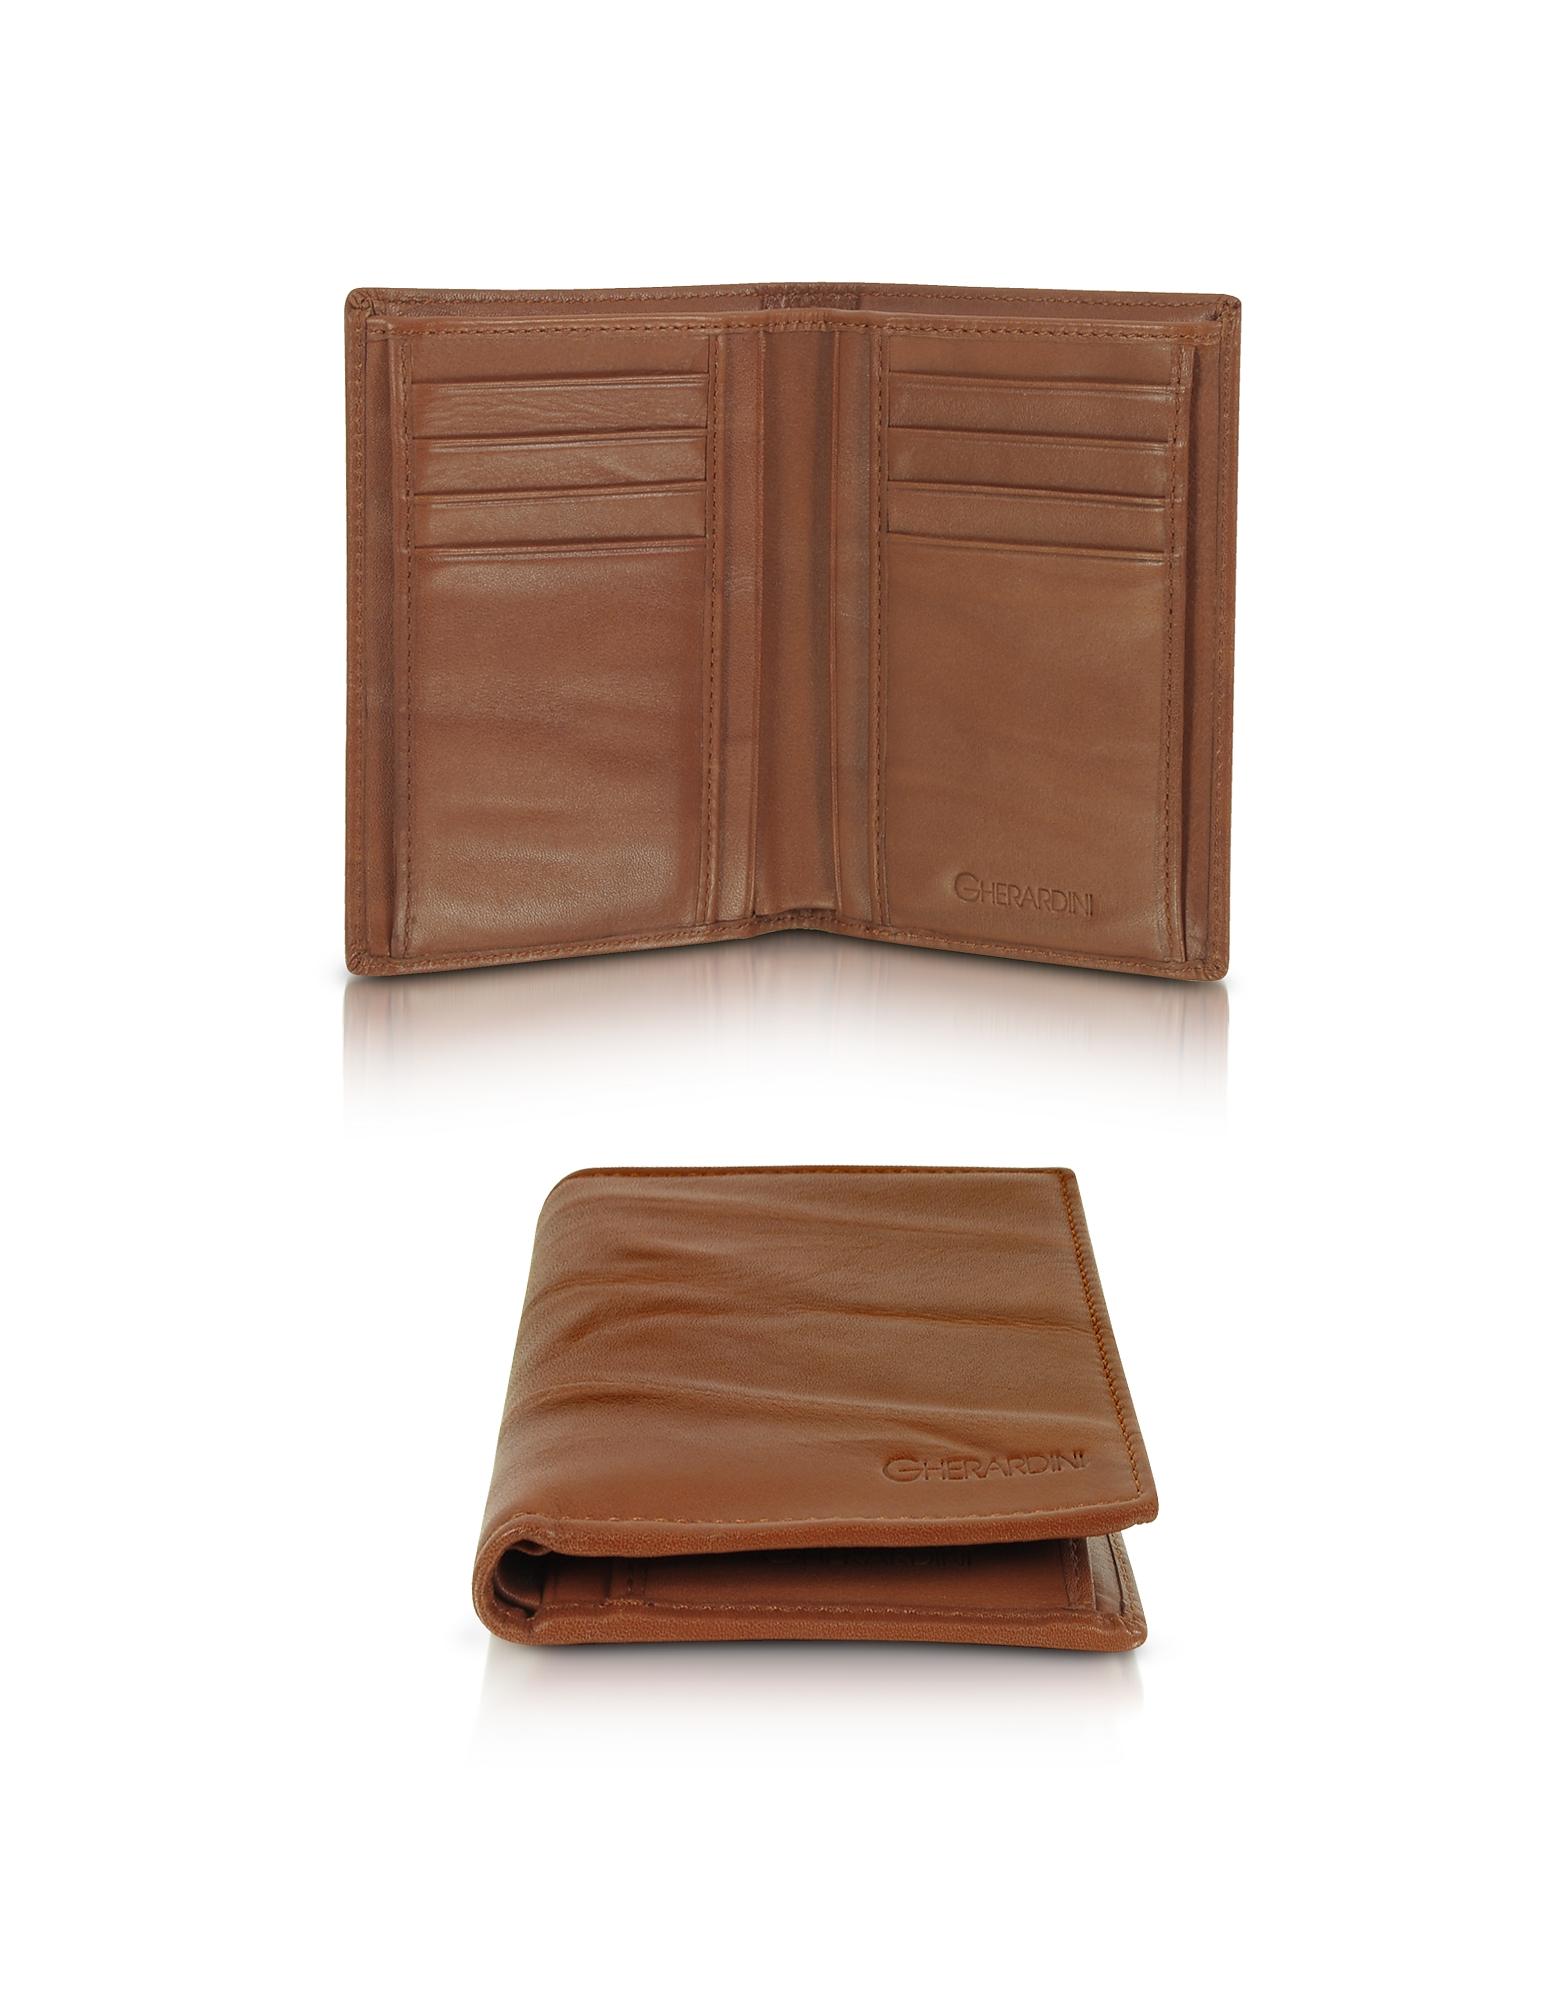 Gherardini Designer Men's Bags, Pleated Leather Men's Vertical Wallet